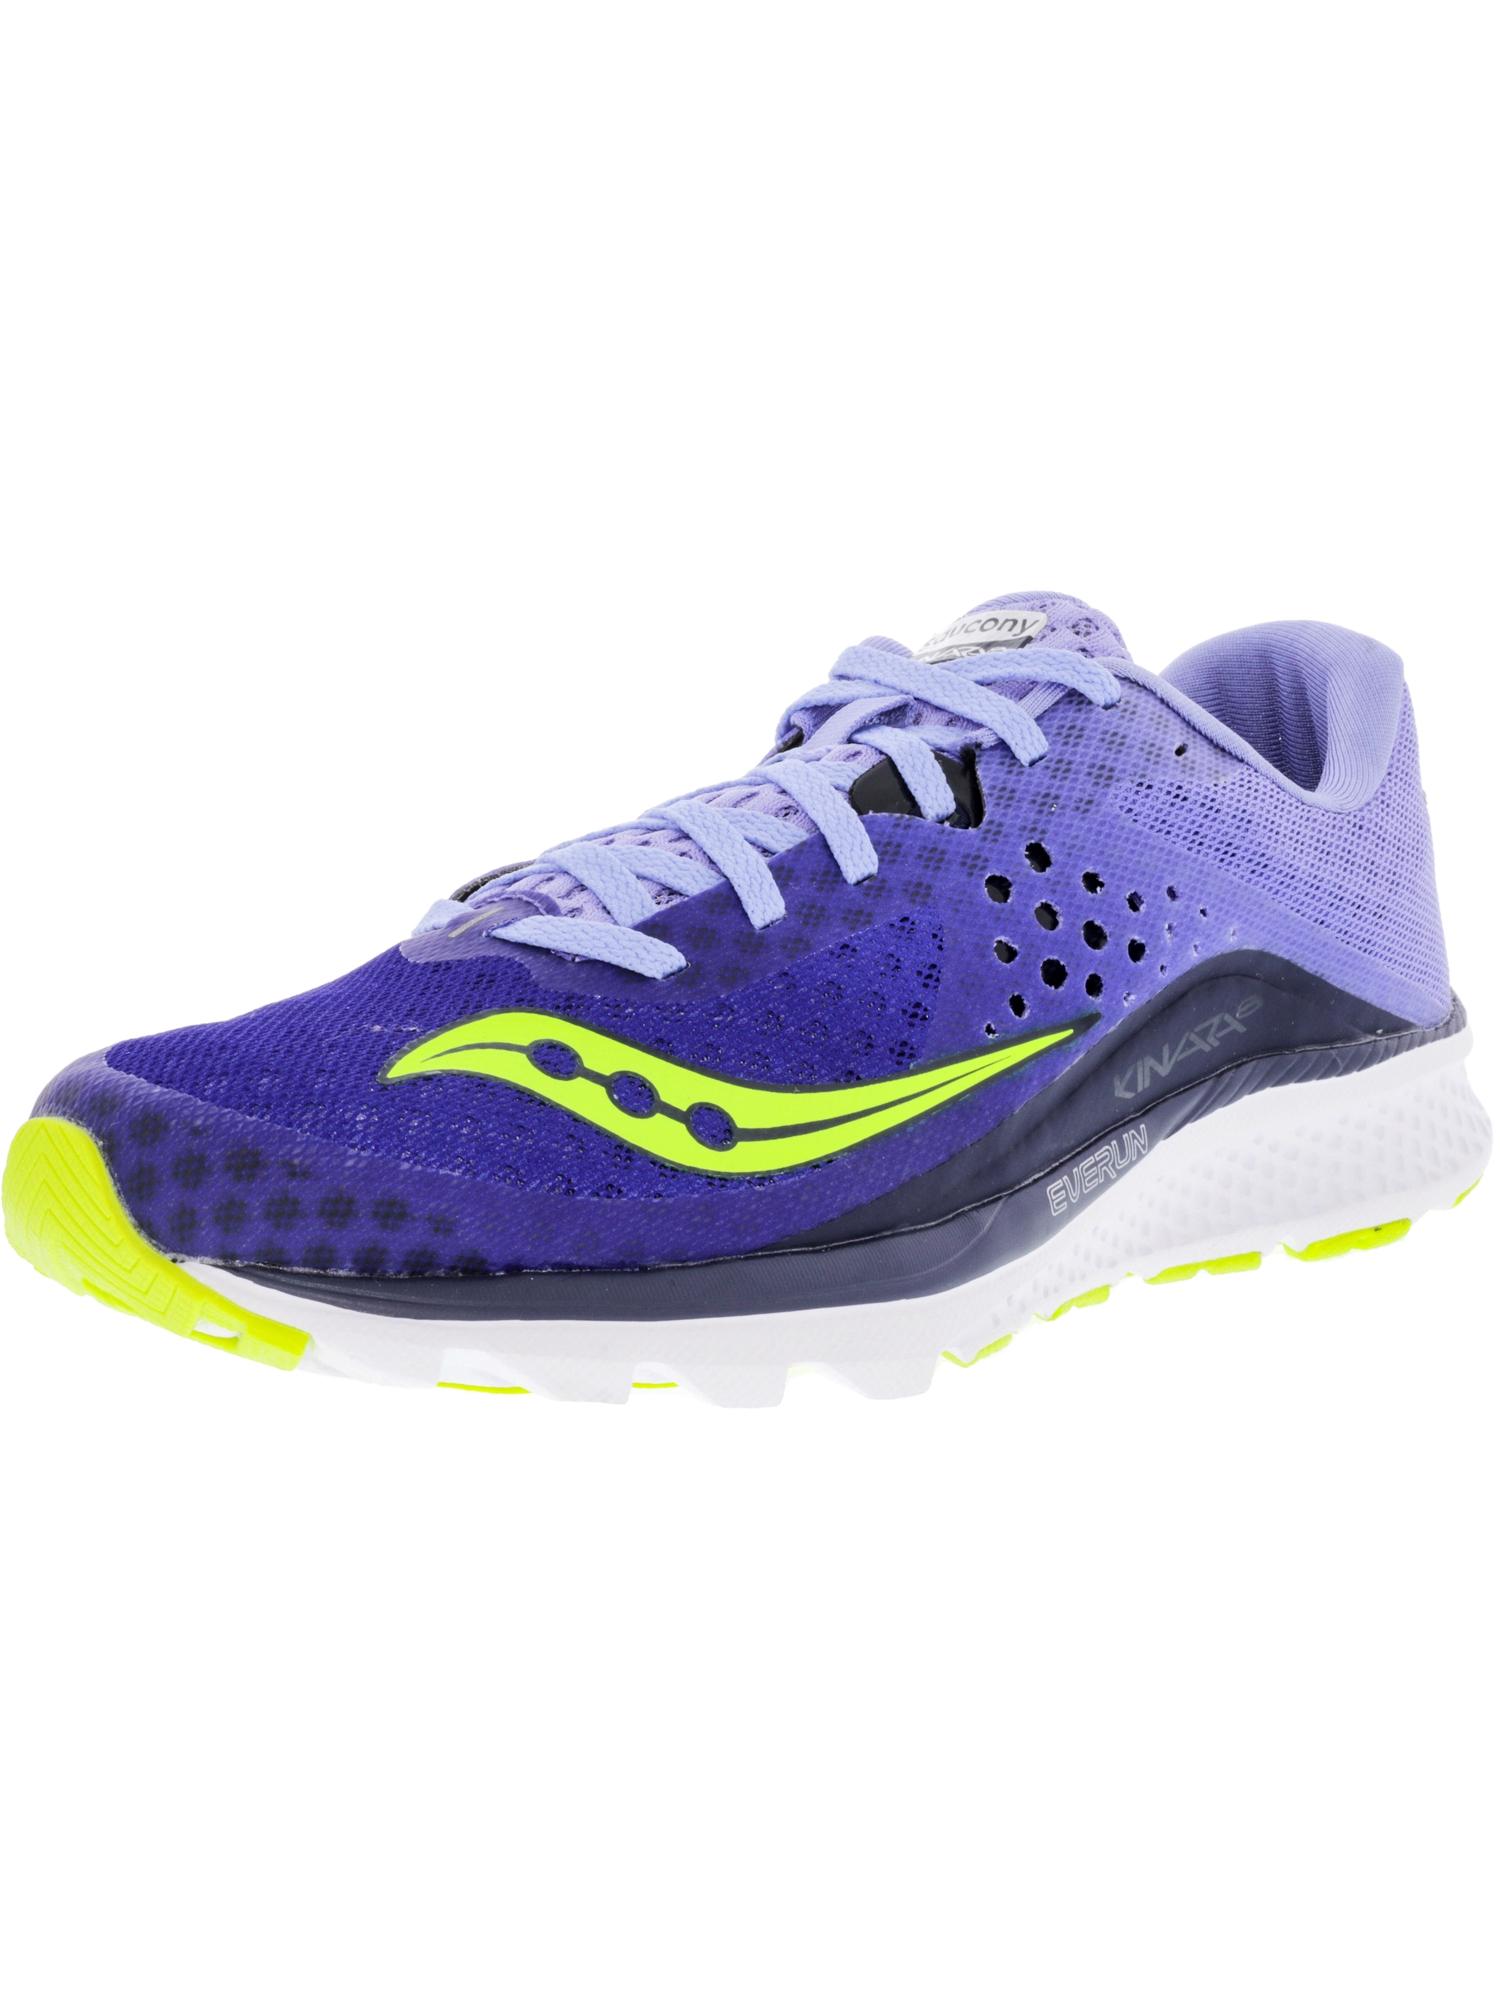 Women's Kinvara 8 Berry / White Ankle-High Running Shoe - 9M